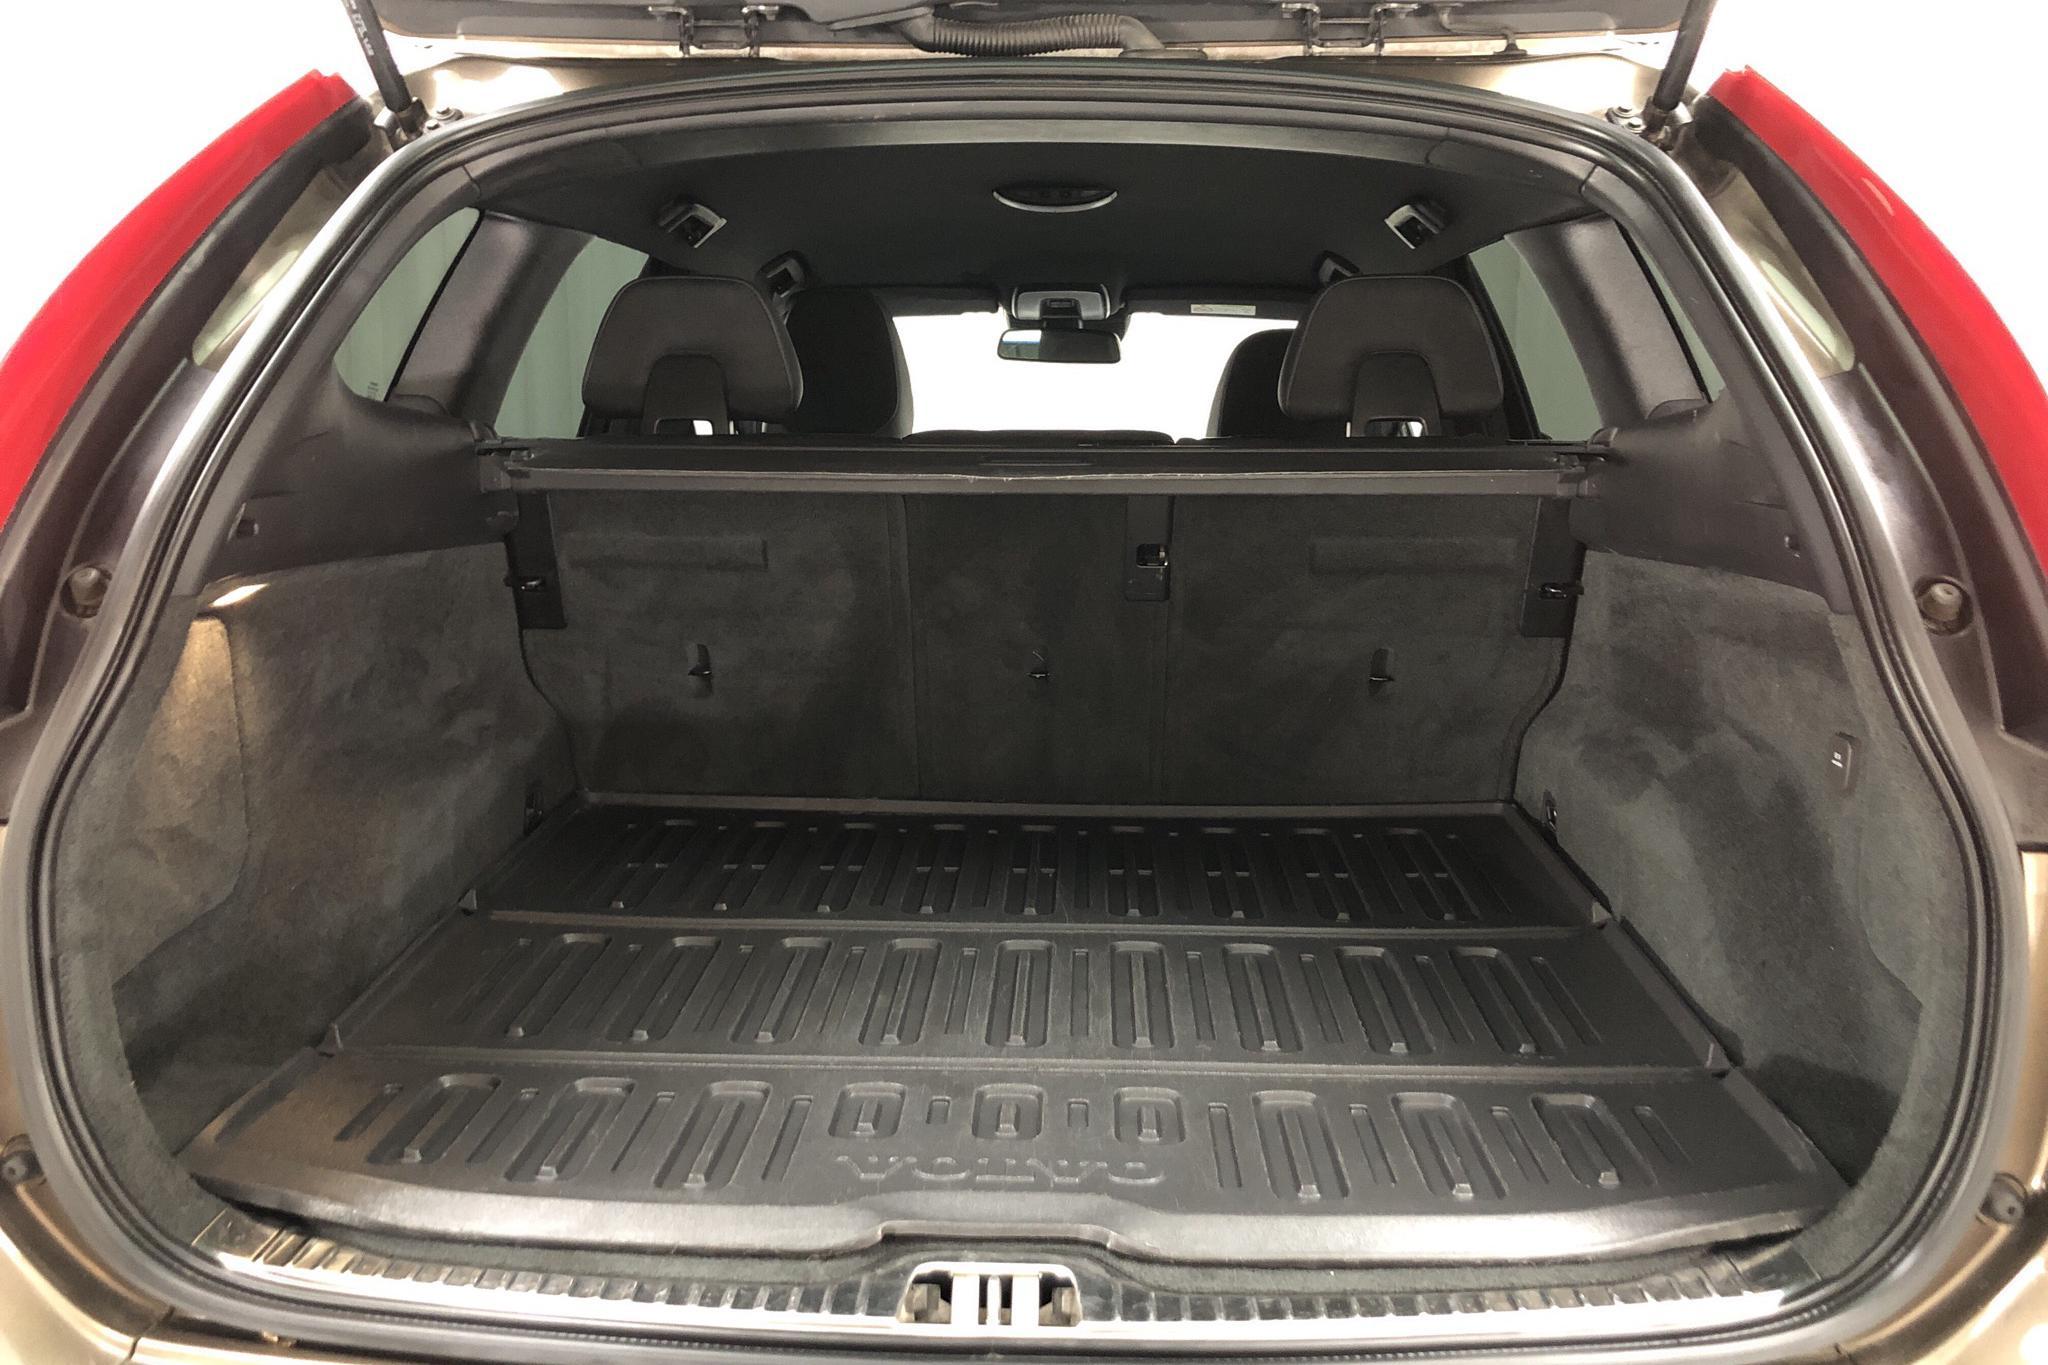 Volvo XC60 D4 AWD (190hk) - 10 335 mil - Automat - brun - 2016